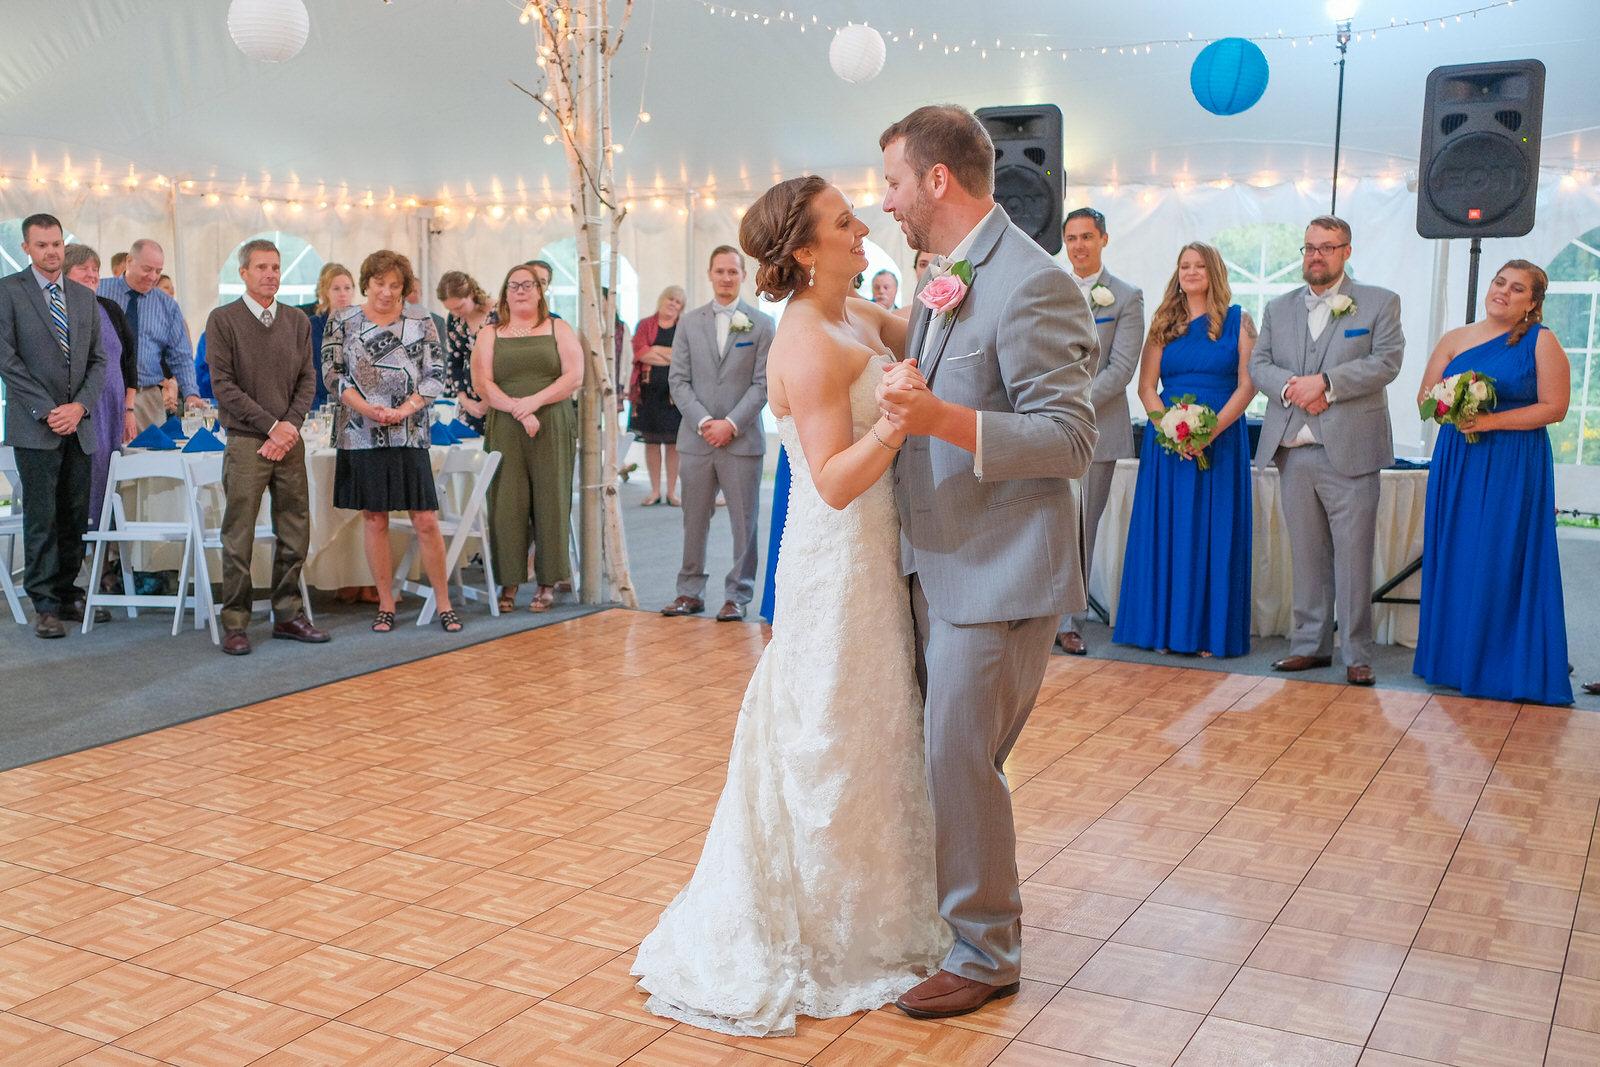 waterville-valley-wedding-photography-1387.jpg